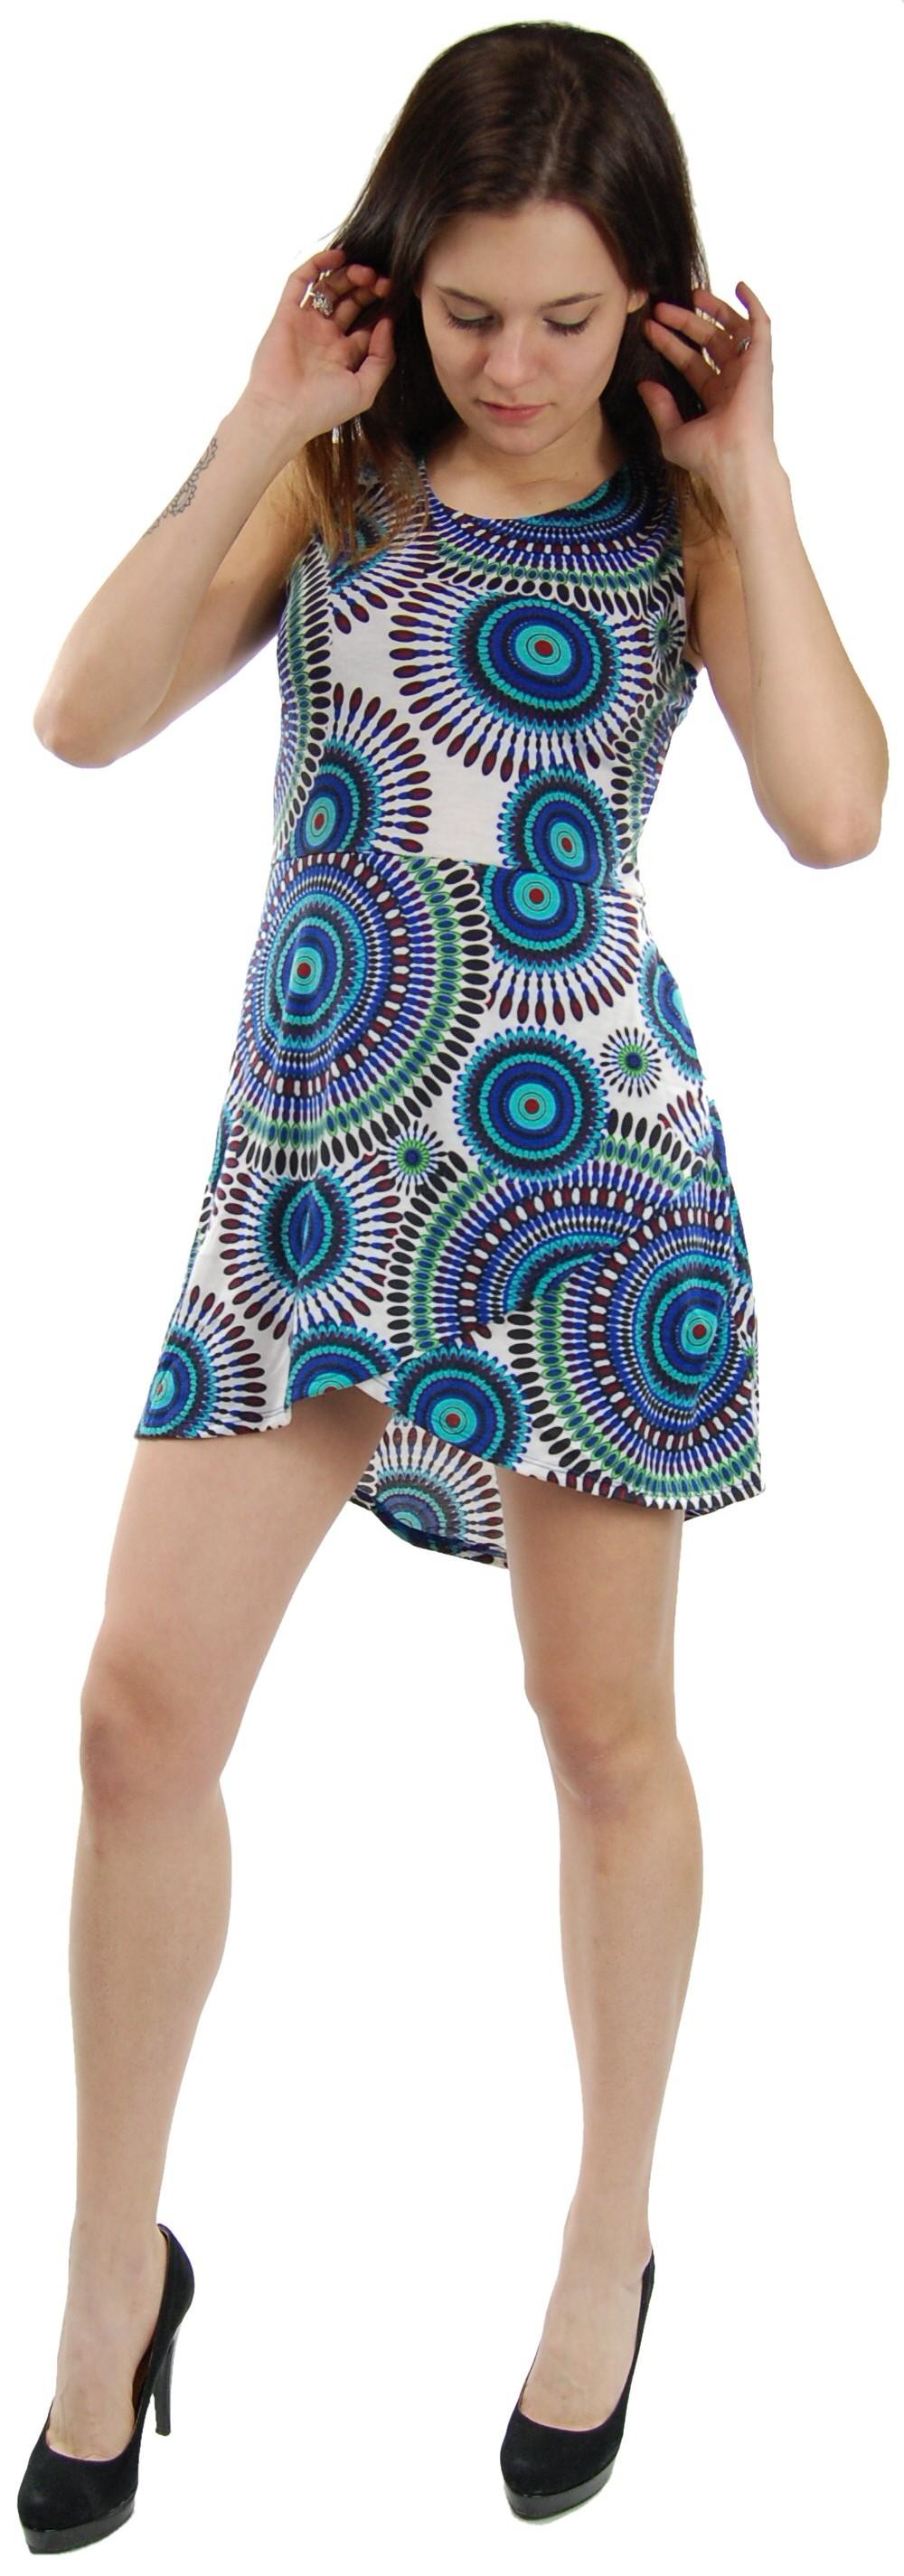 SUMMER SLEEVELESS JERSEY DRESSES AB-MRS377-F2 - Oriente Import S.r.l.